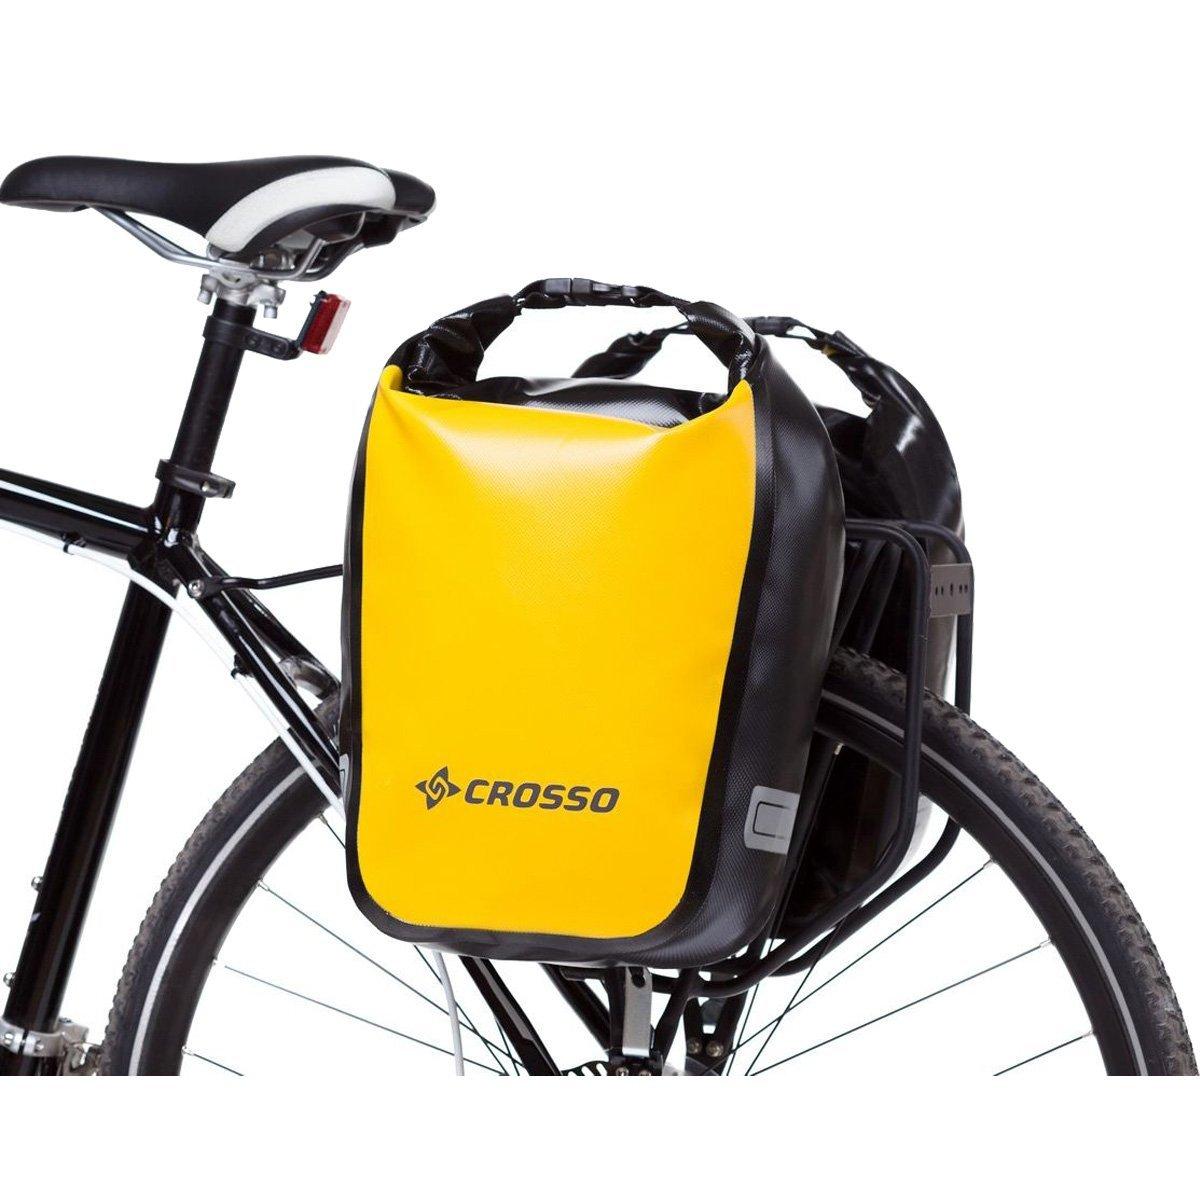 Bicicleta bolsillos adaptador para portaequipajes Crosso plata